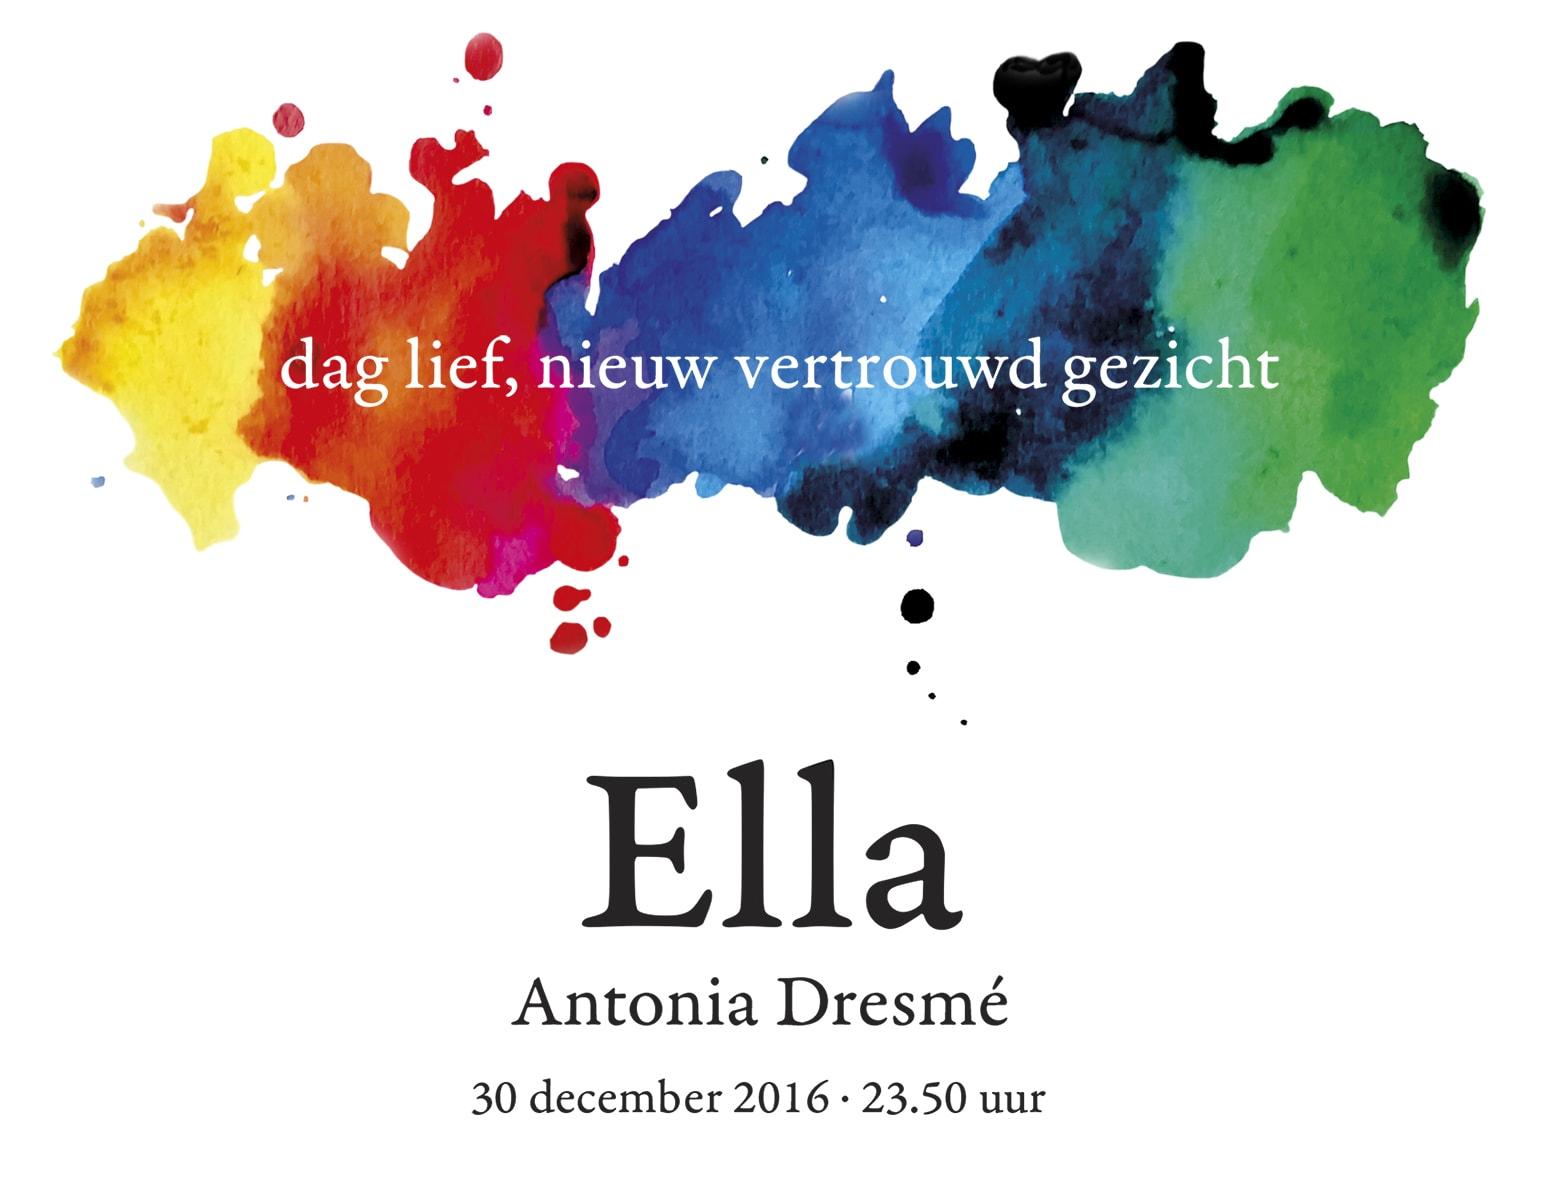 geboortekaartje Ella Dresmé